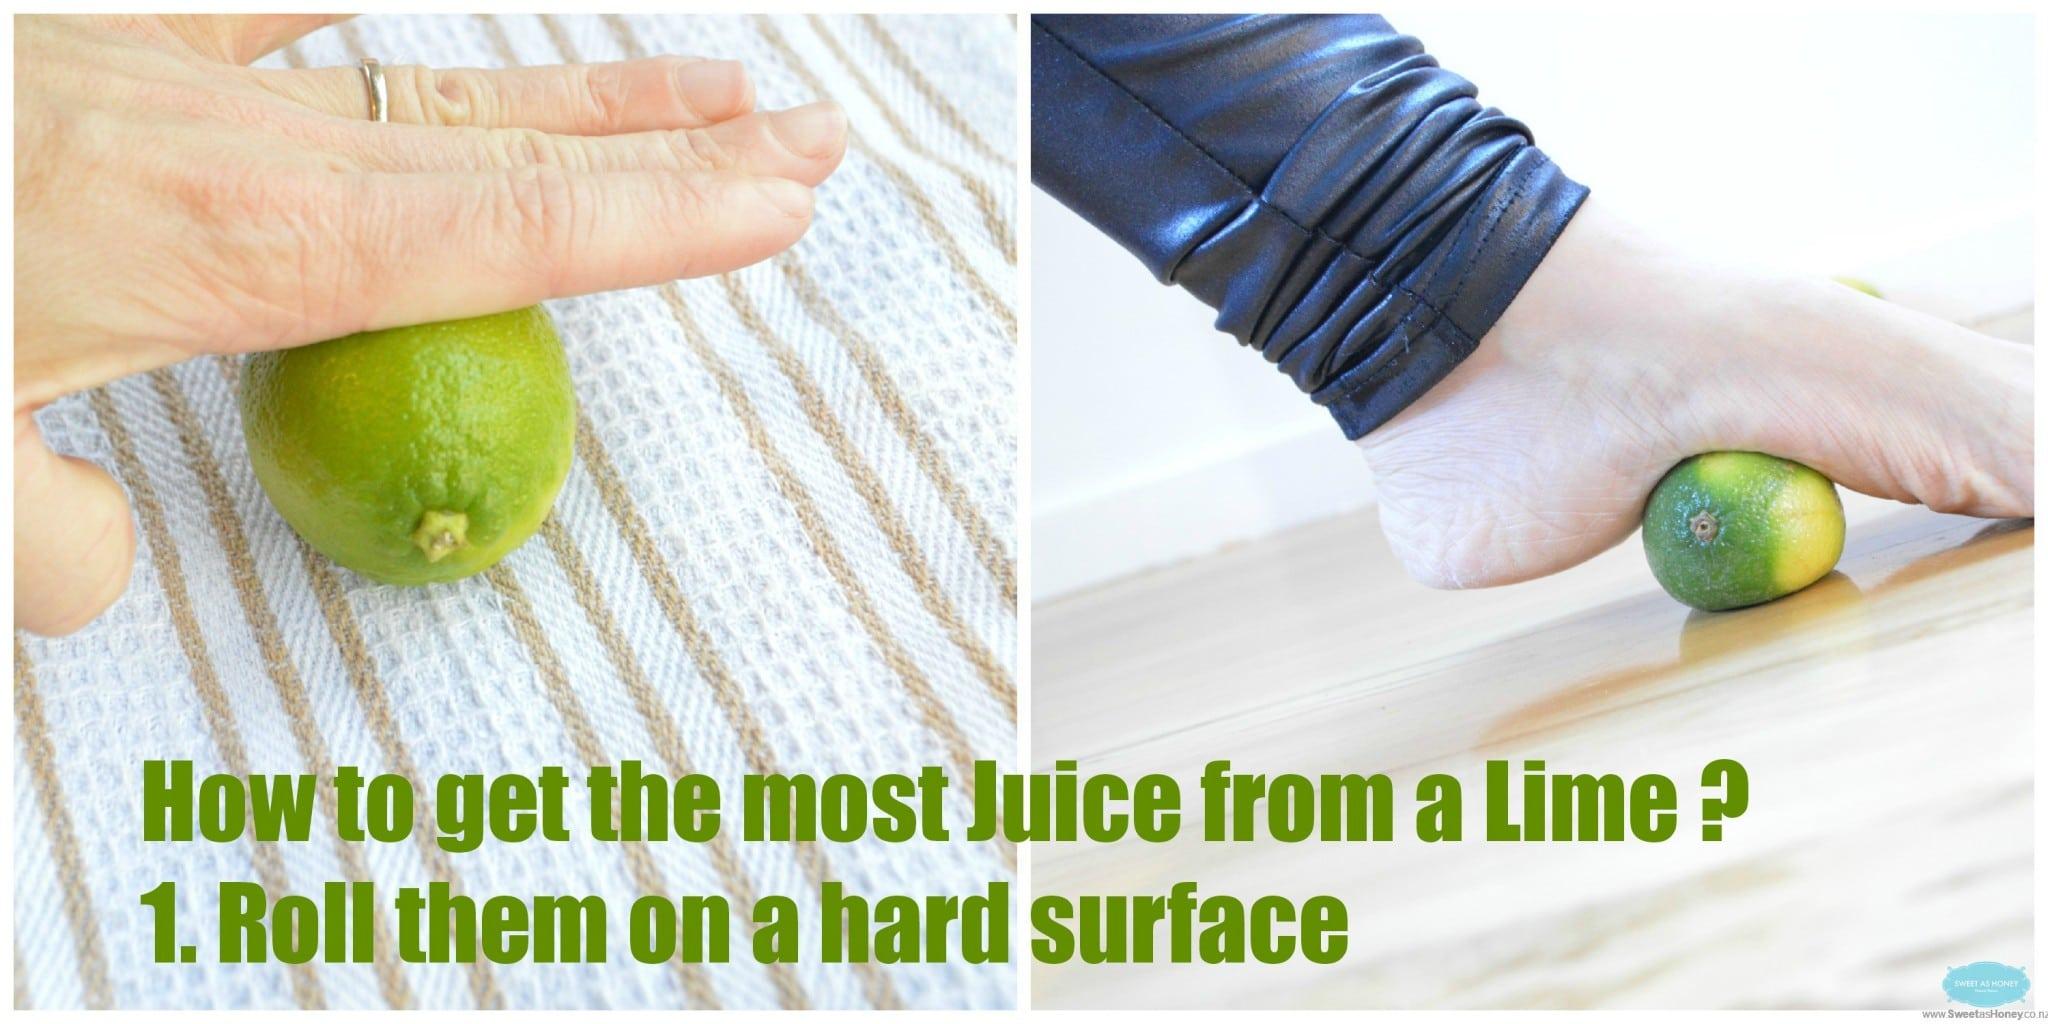 lemon press on hard surface text